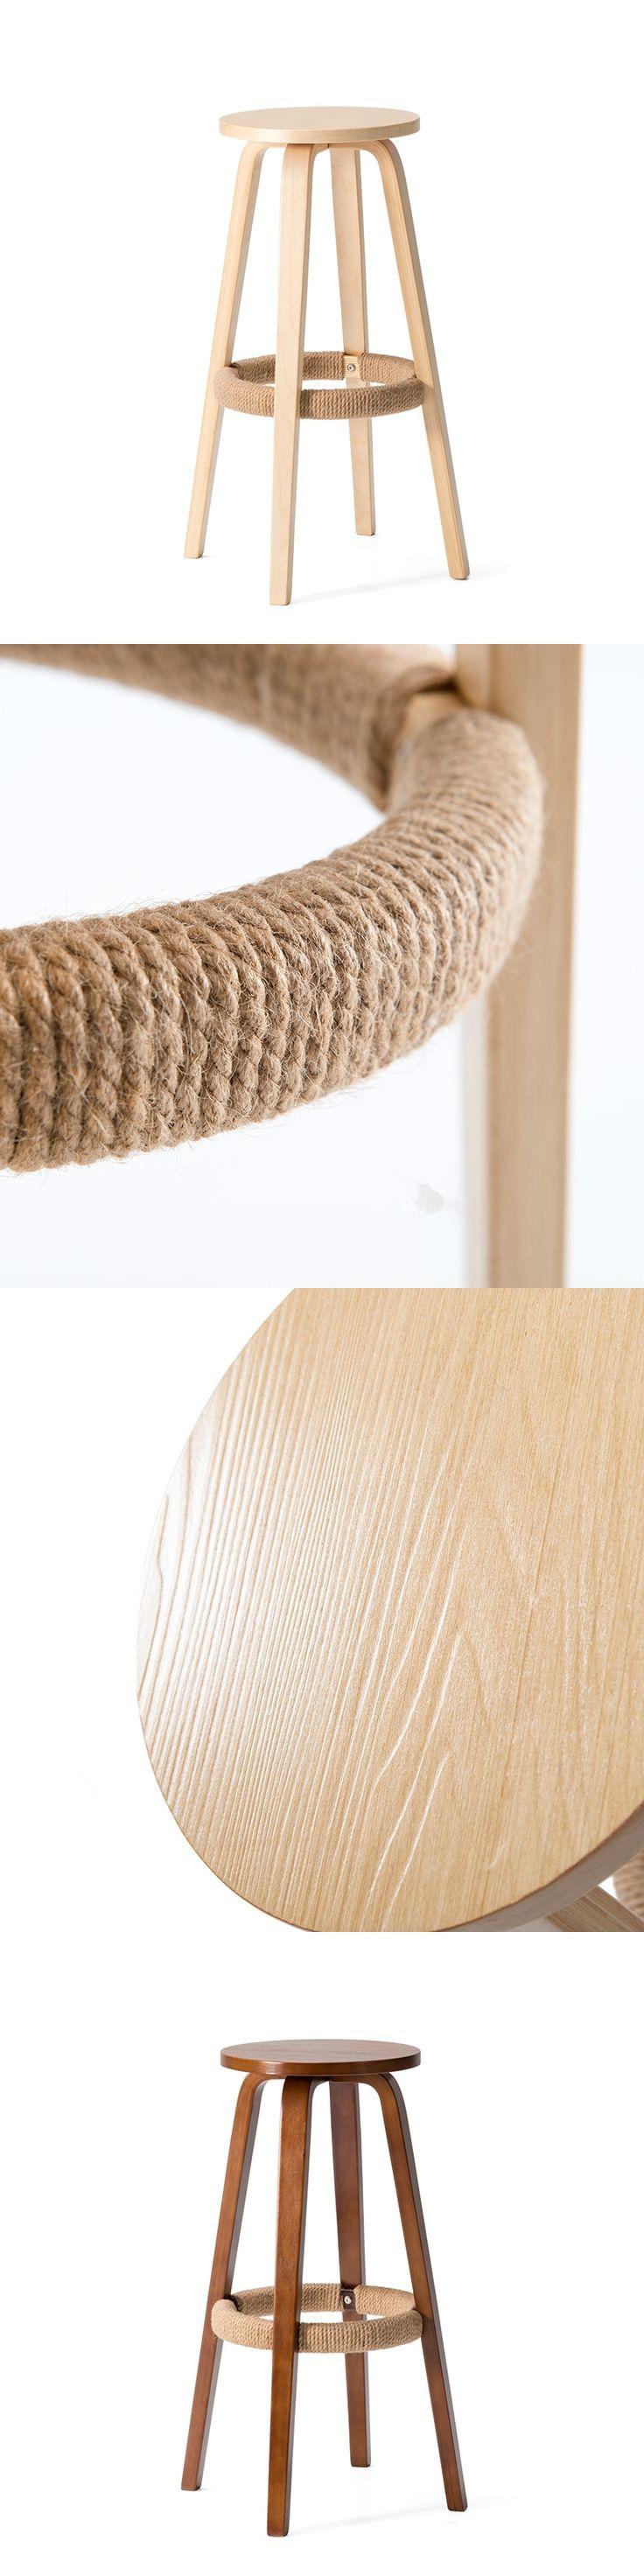 Best 25 Wooden swivel bar stools ideas on Pinterest